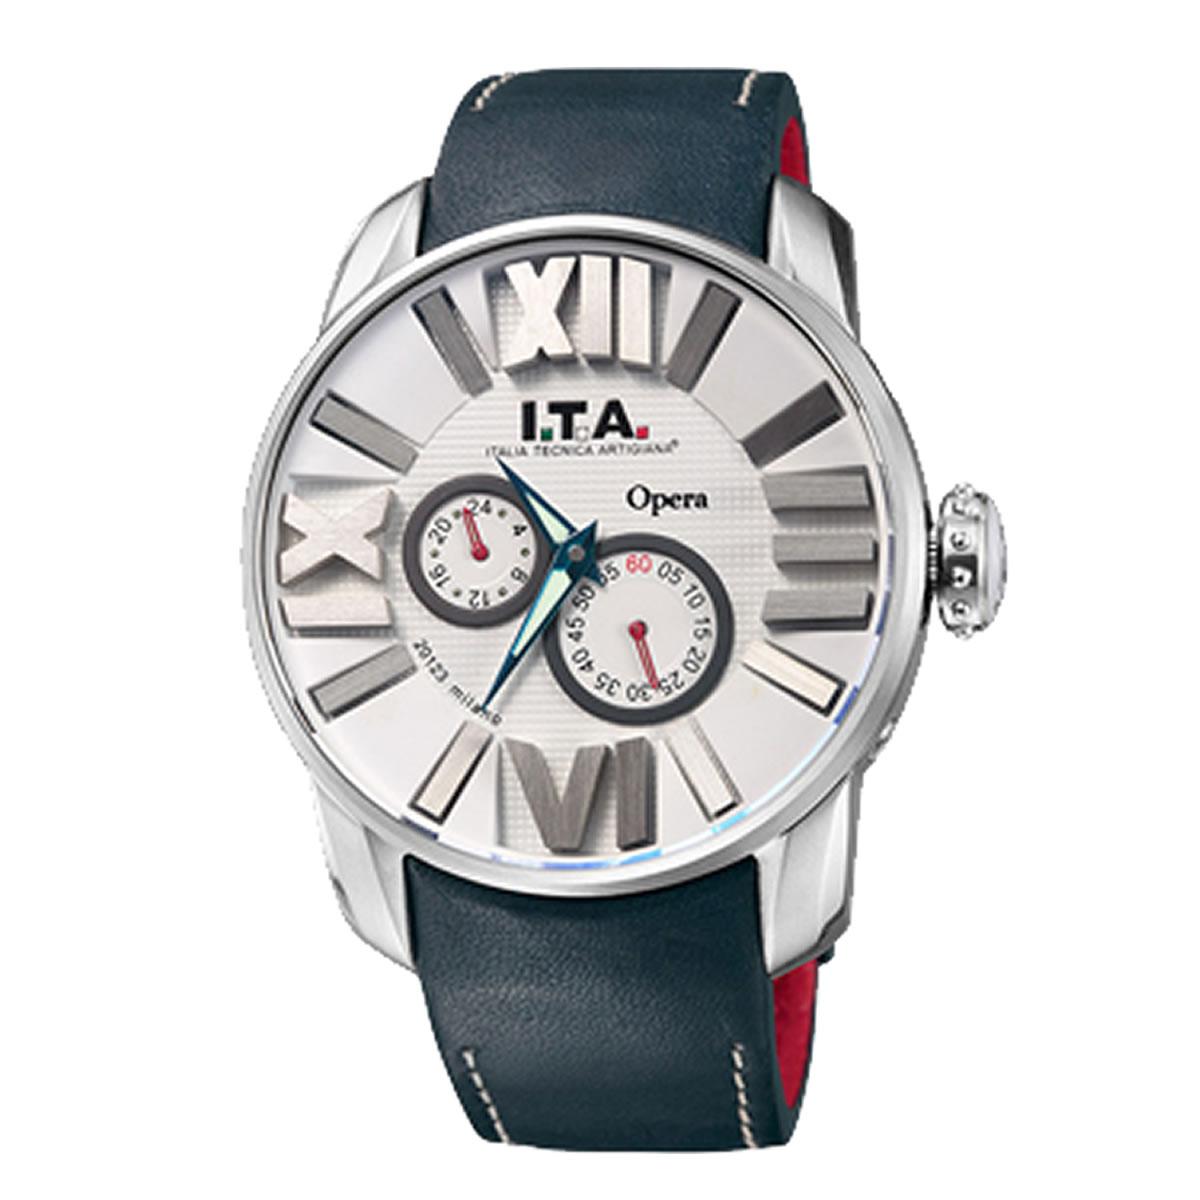 I.T.A. オペラ ホワイト/ネイビー ref.21.00.07